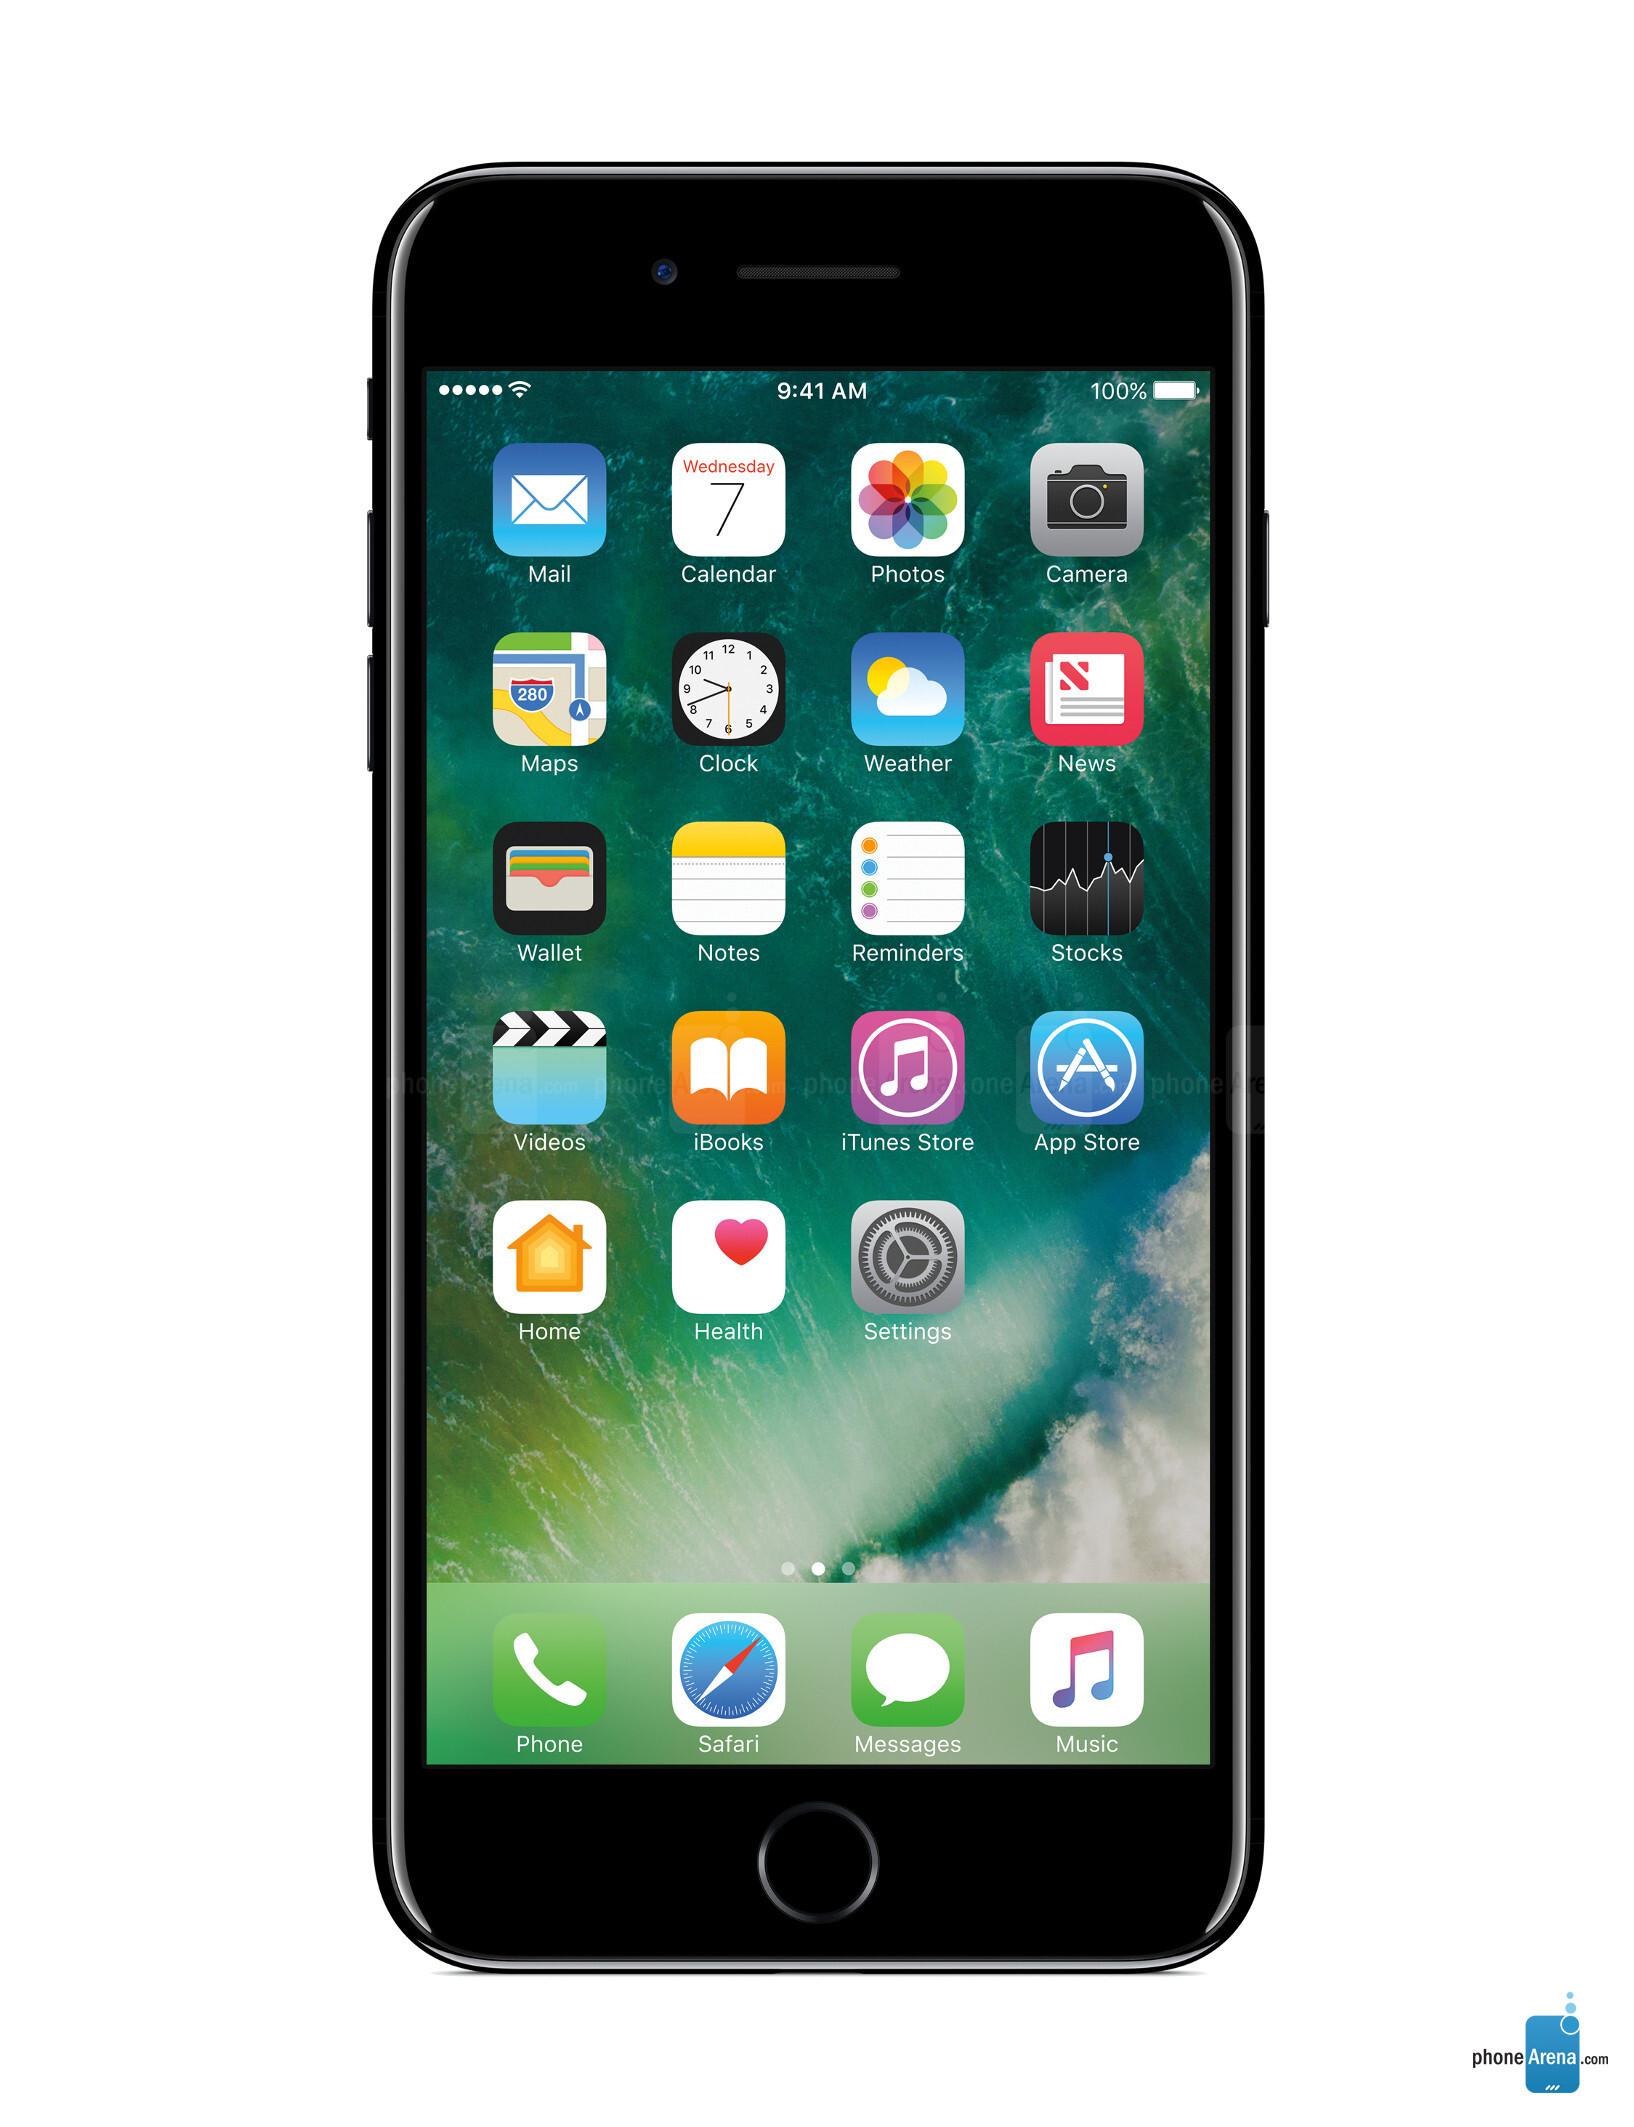 Apple iPhone 7 Plus size comparison versus iPhone 6s Plus, Galaxy Note 7, LG V20, Nexus 6P, S7 ...